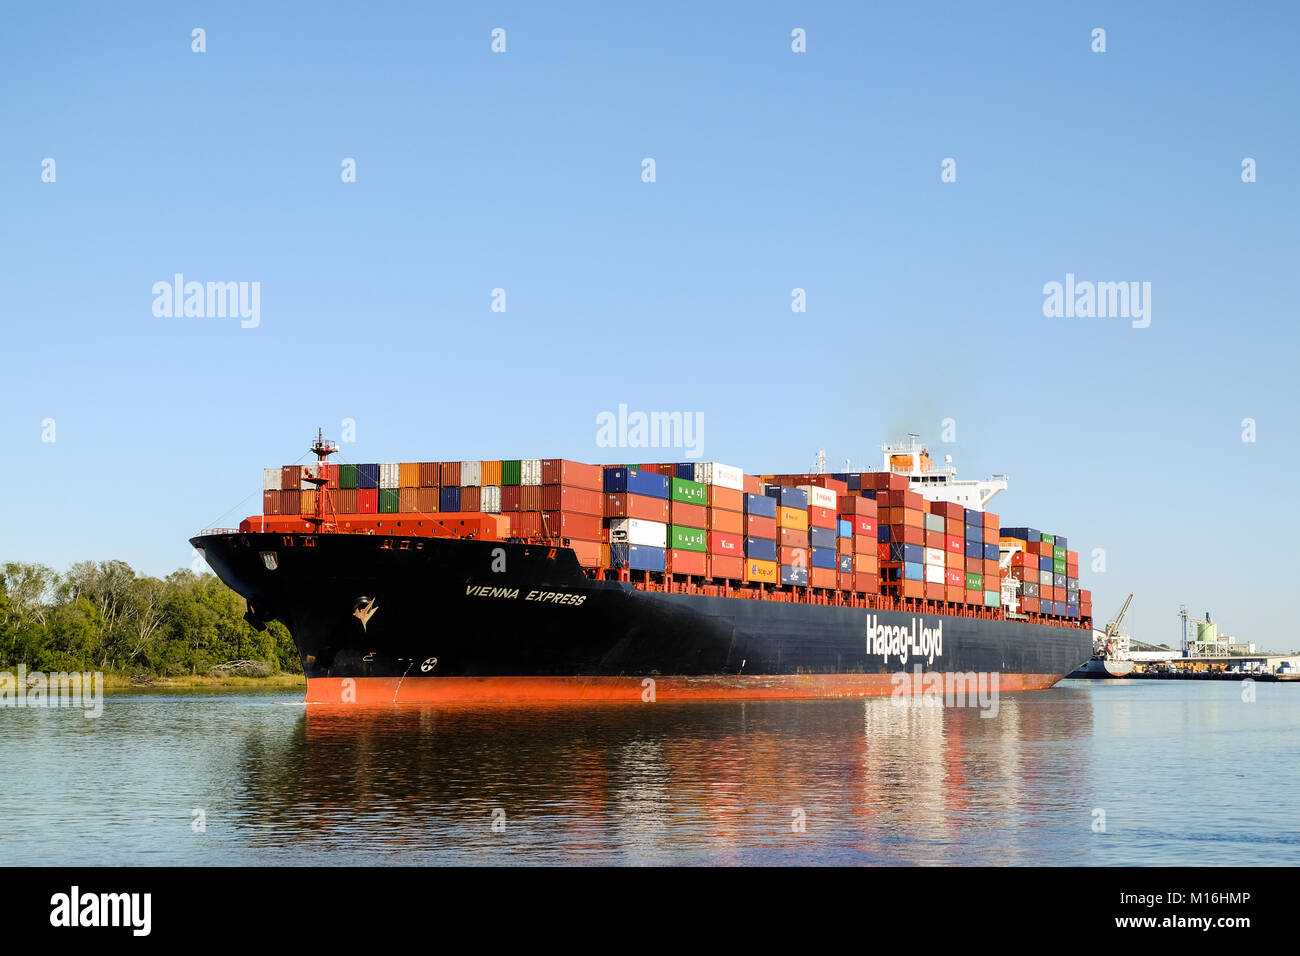 Usa Georgia Ga Savannah Container Stock Photos & Usa Georgia